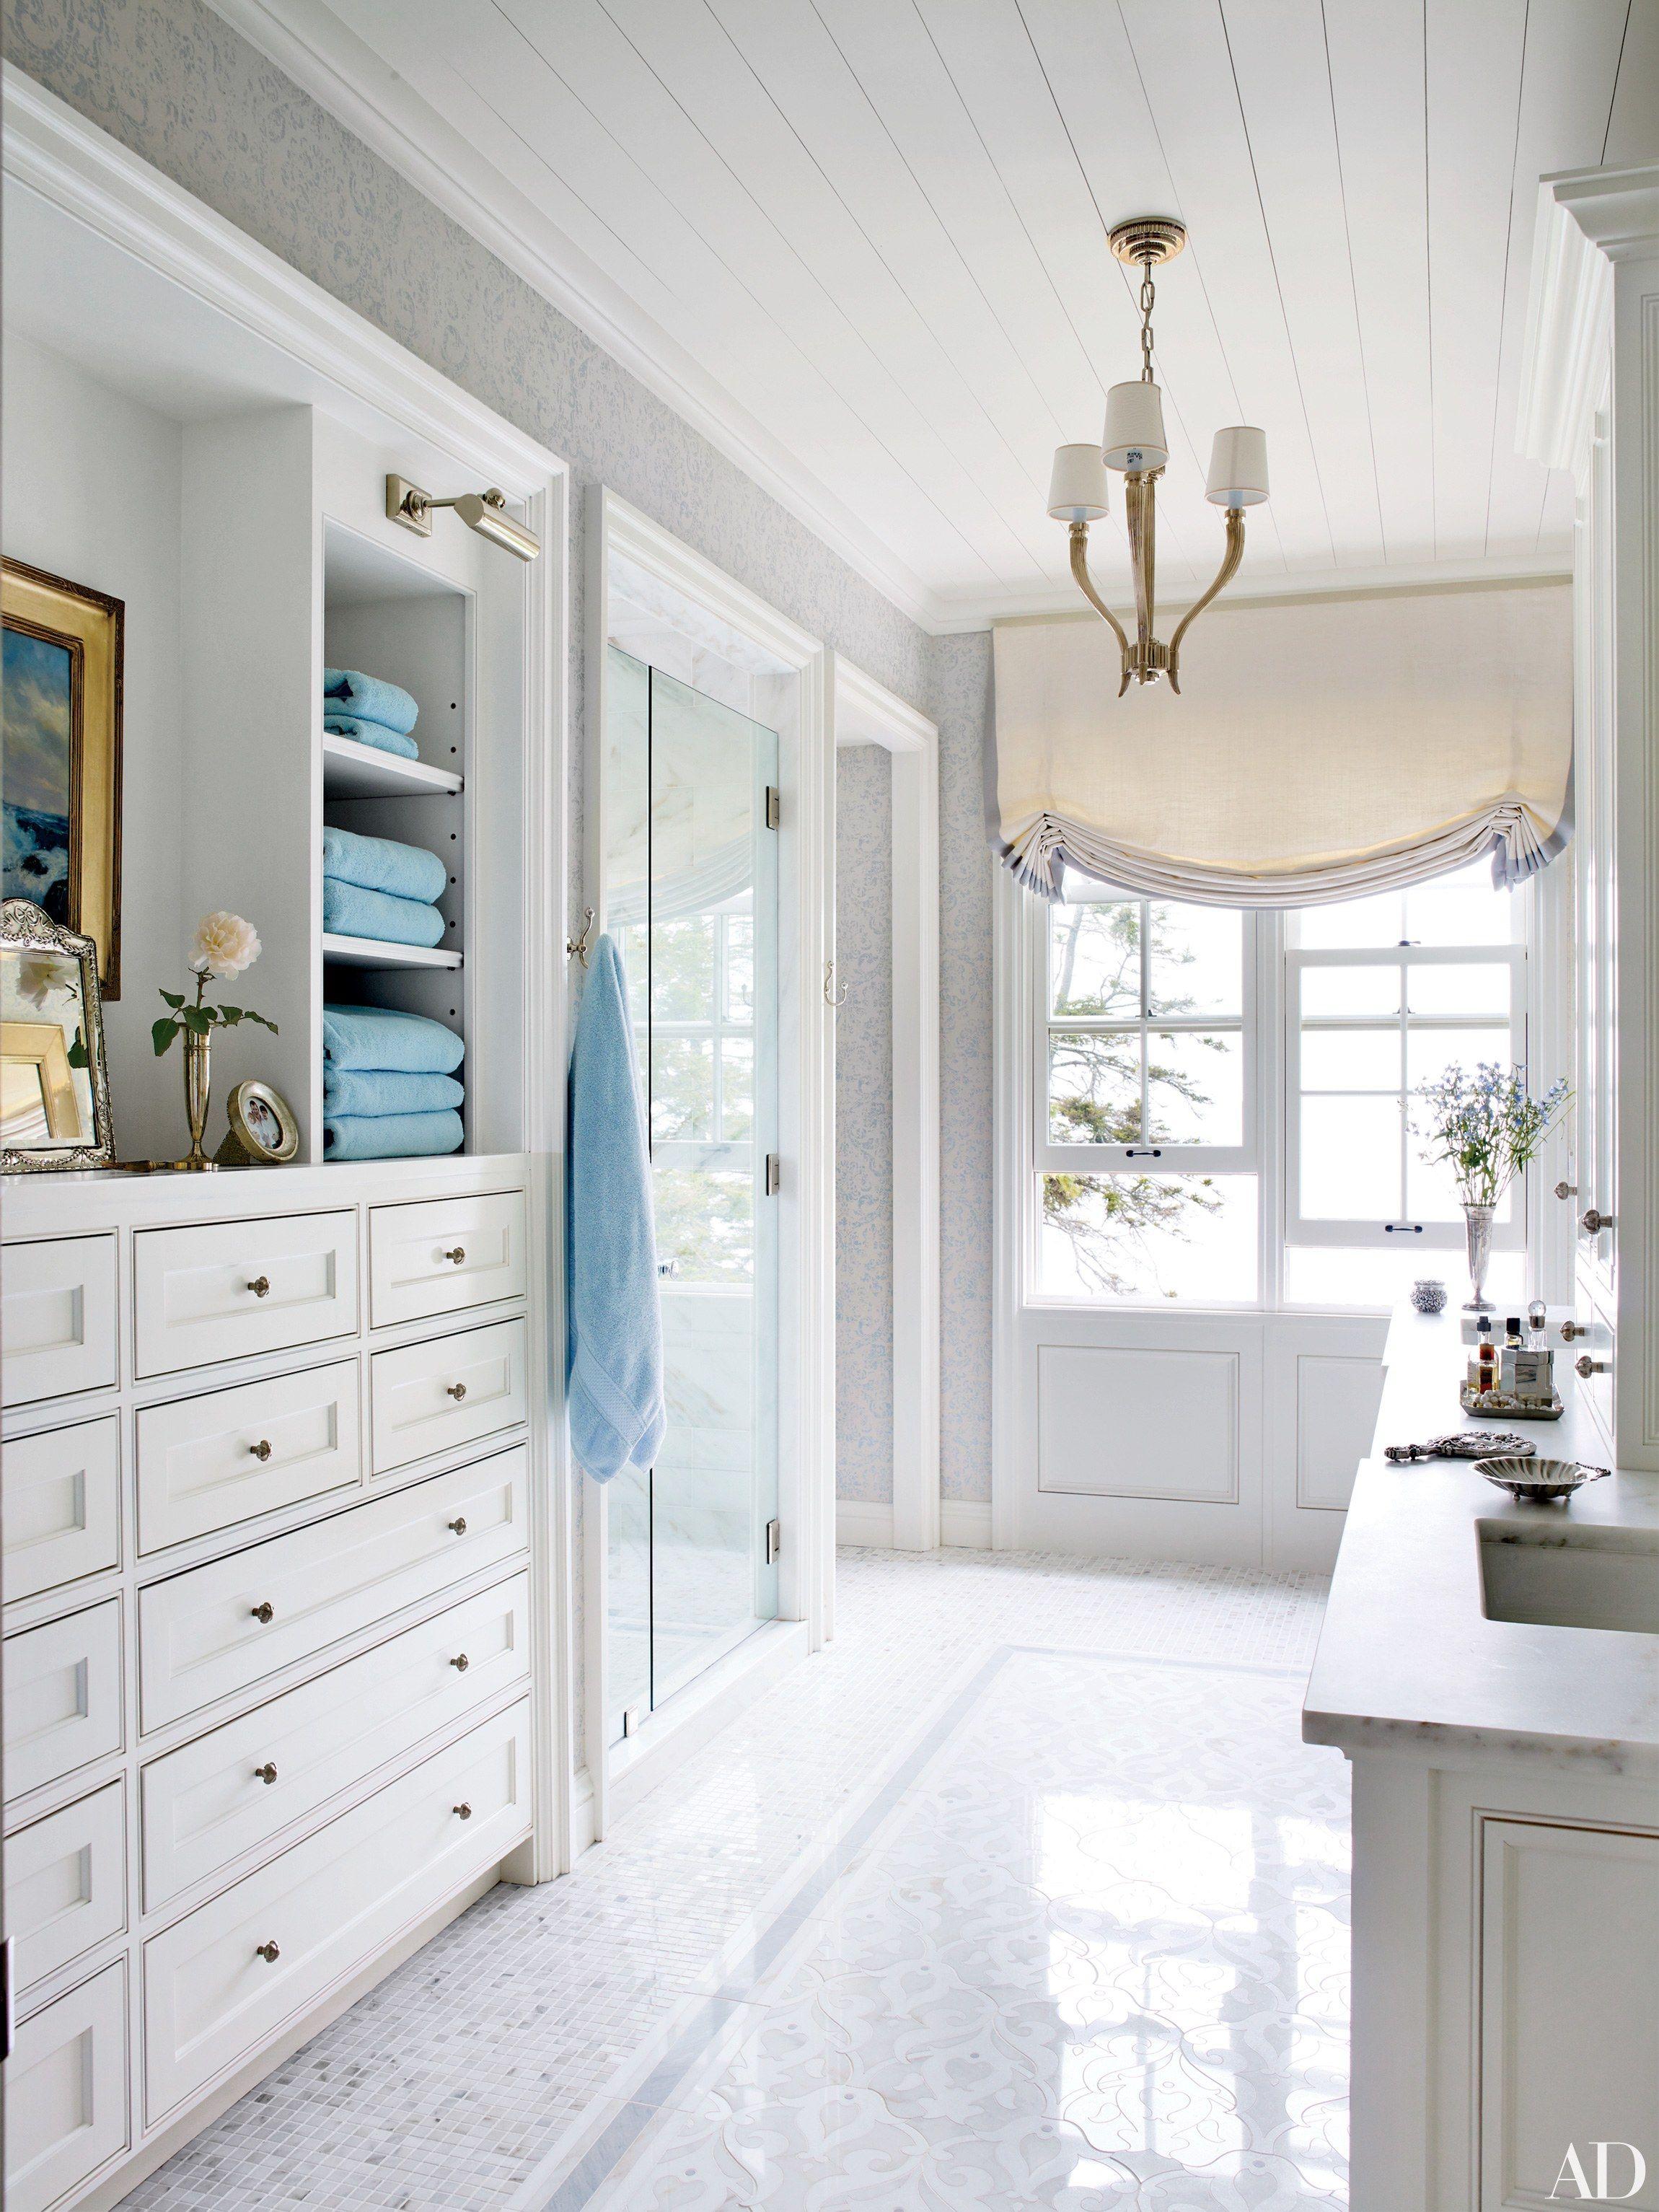 You Definitely Need These Genius Bathroom Storage Ideas   Pinterest ...